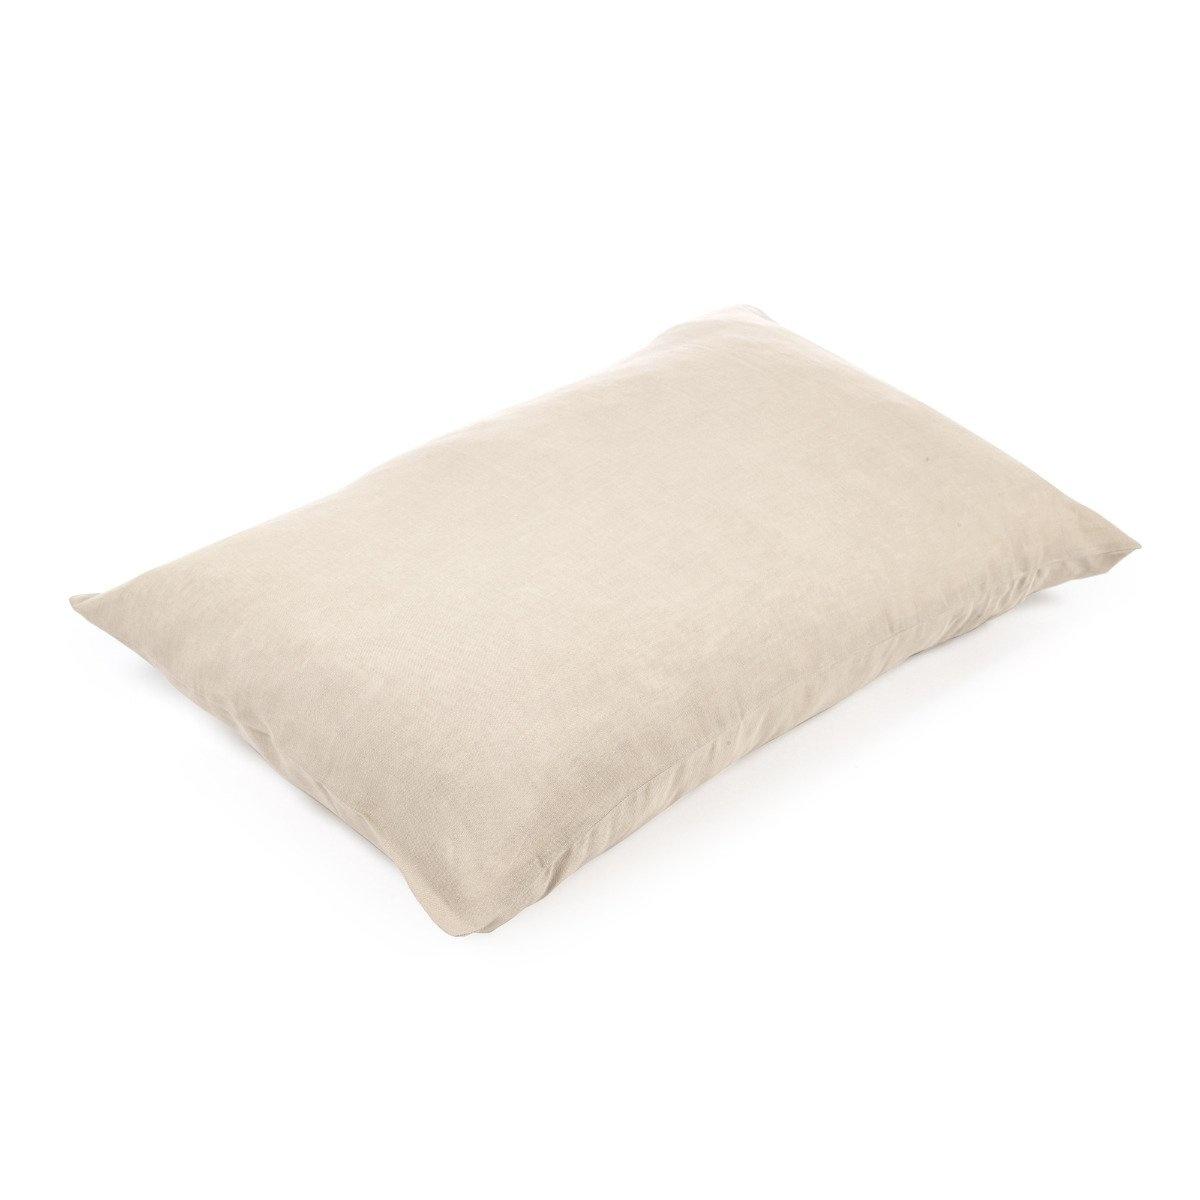 Pillowcase - Santiago - Asst Colours-3